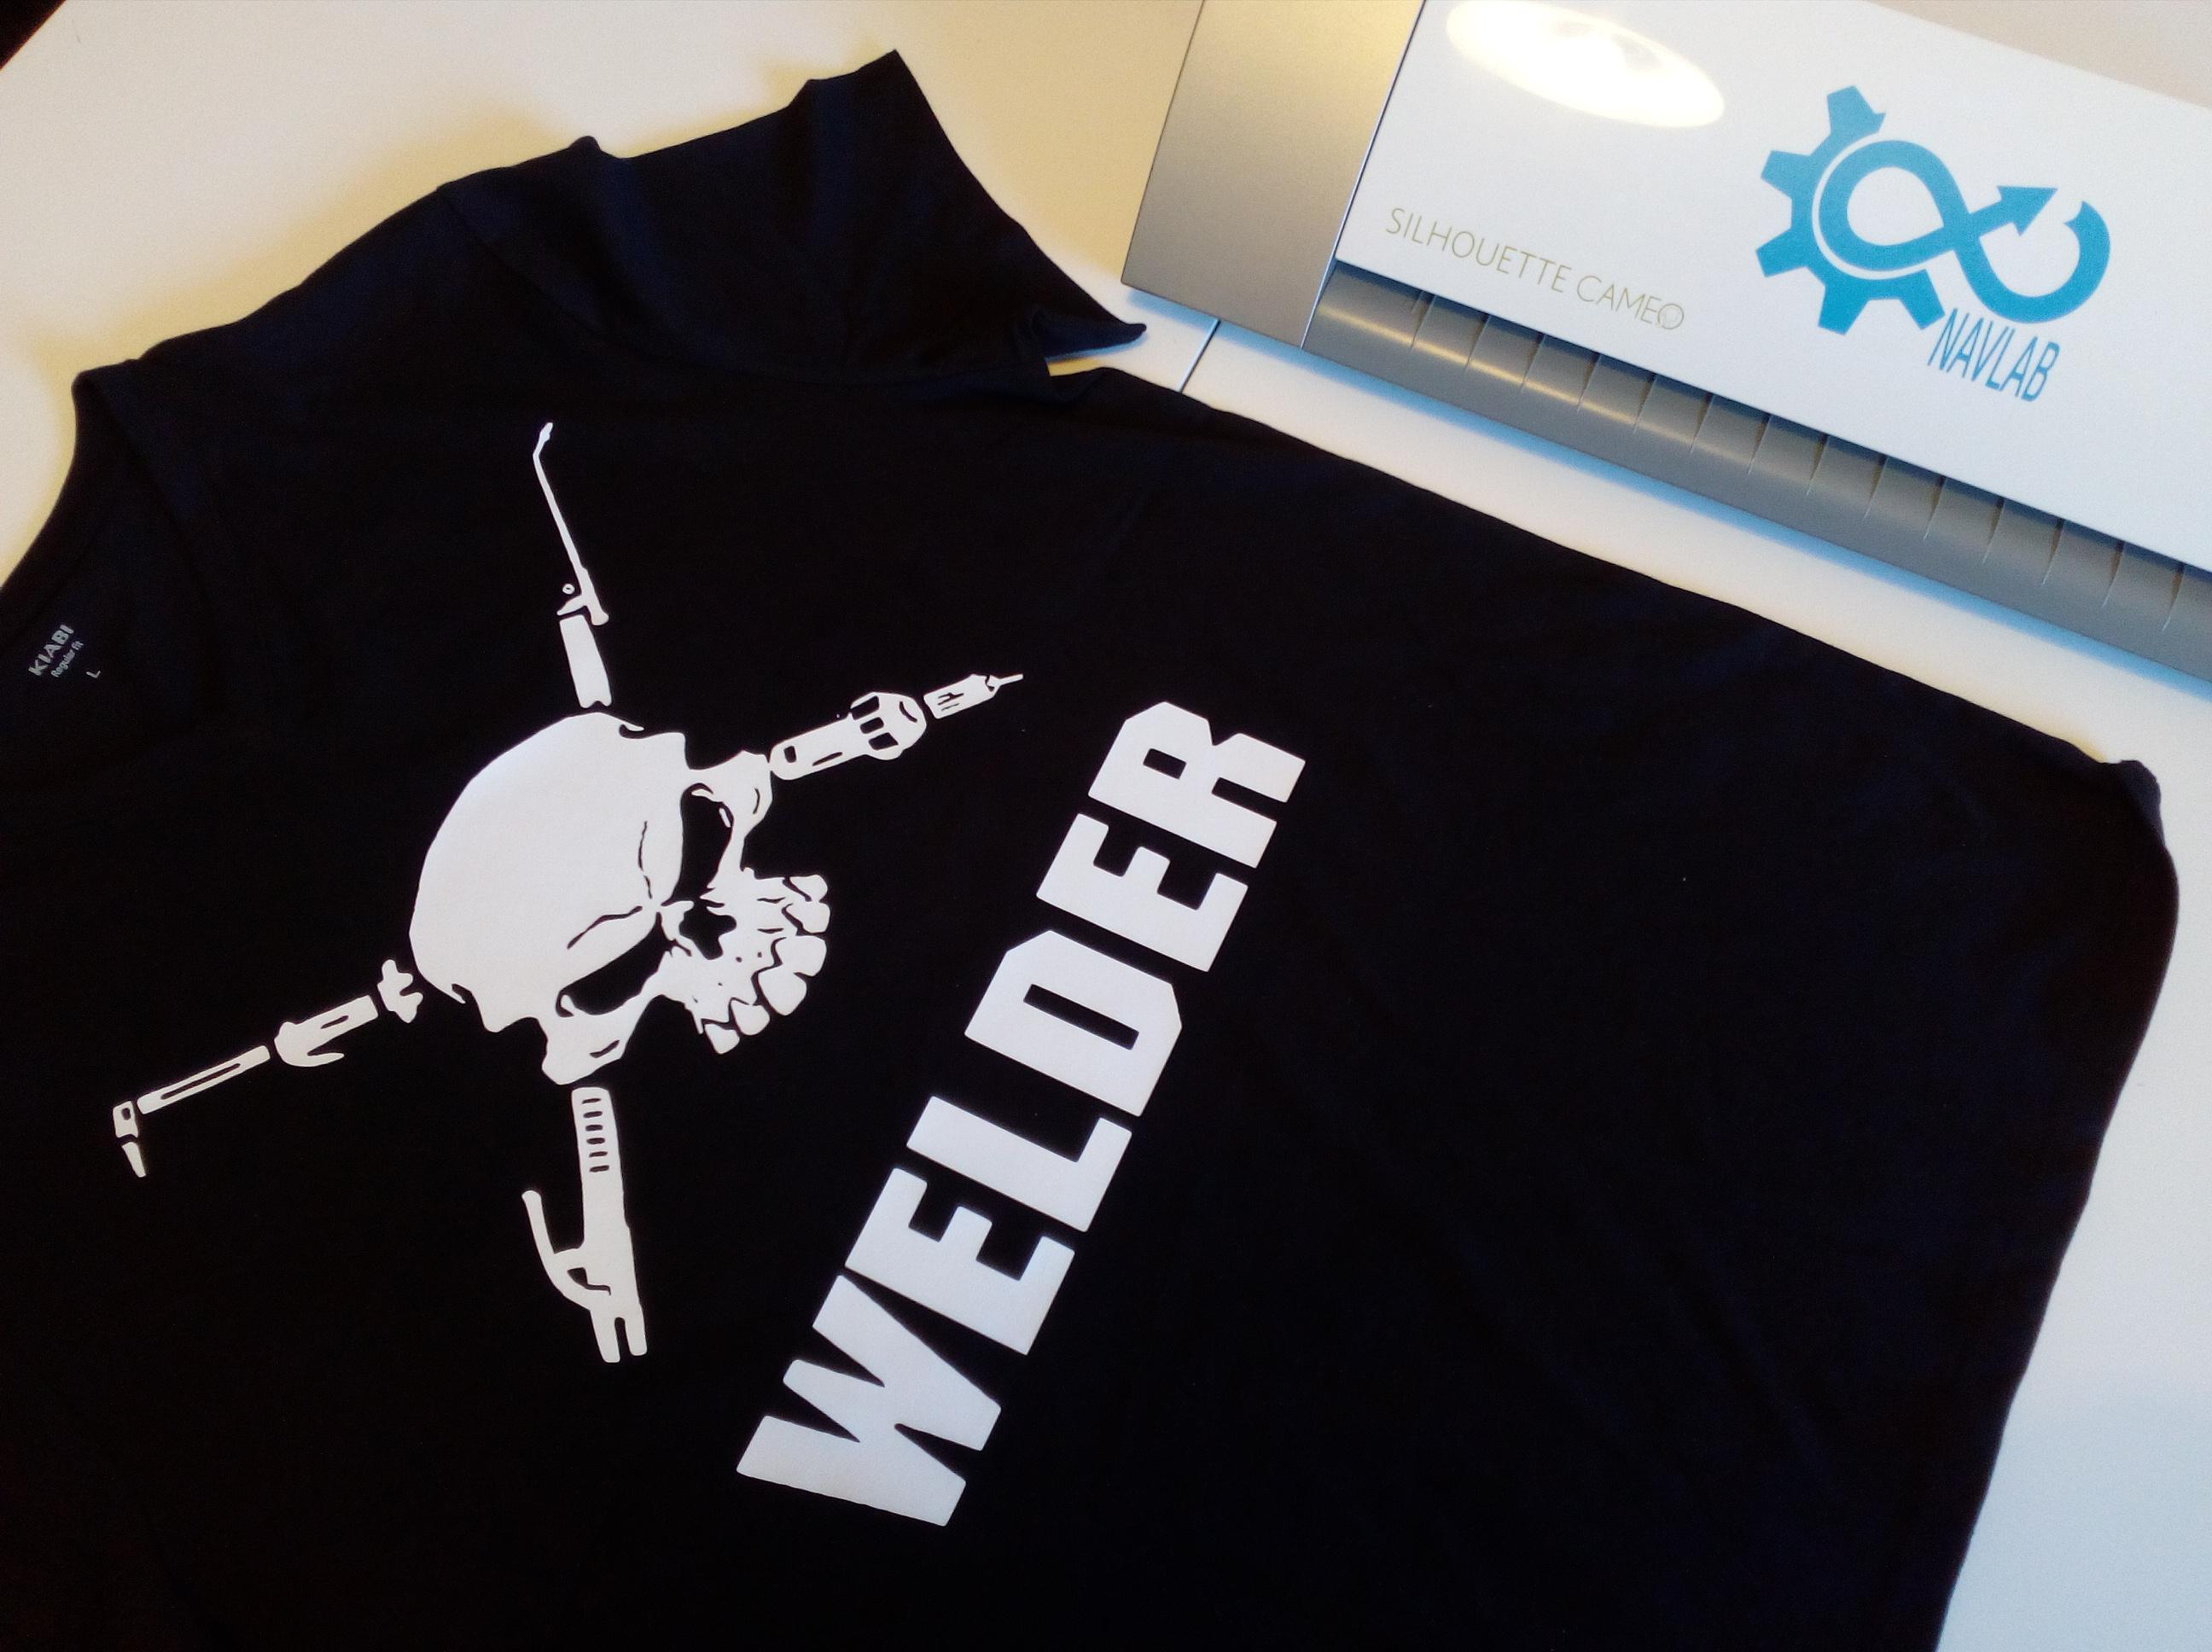 NavLab flocage tshirt silhouette cameo welder crane diy